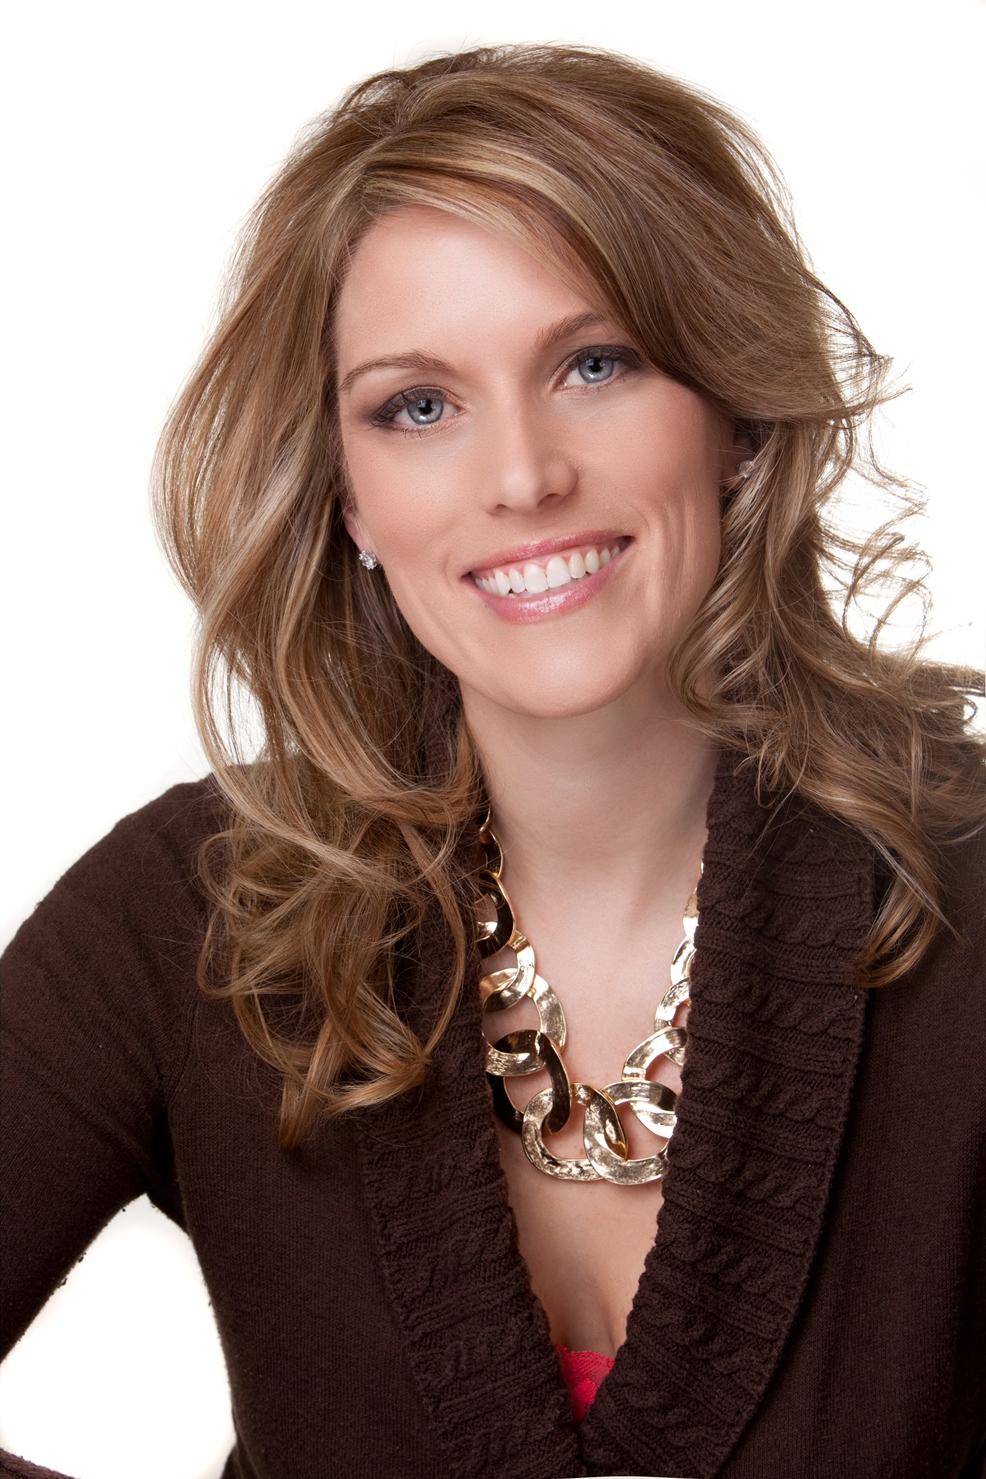 South Shore Skin Center and Spa Names Samantha Grout as Medical Spa Director